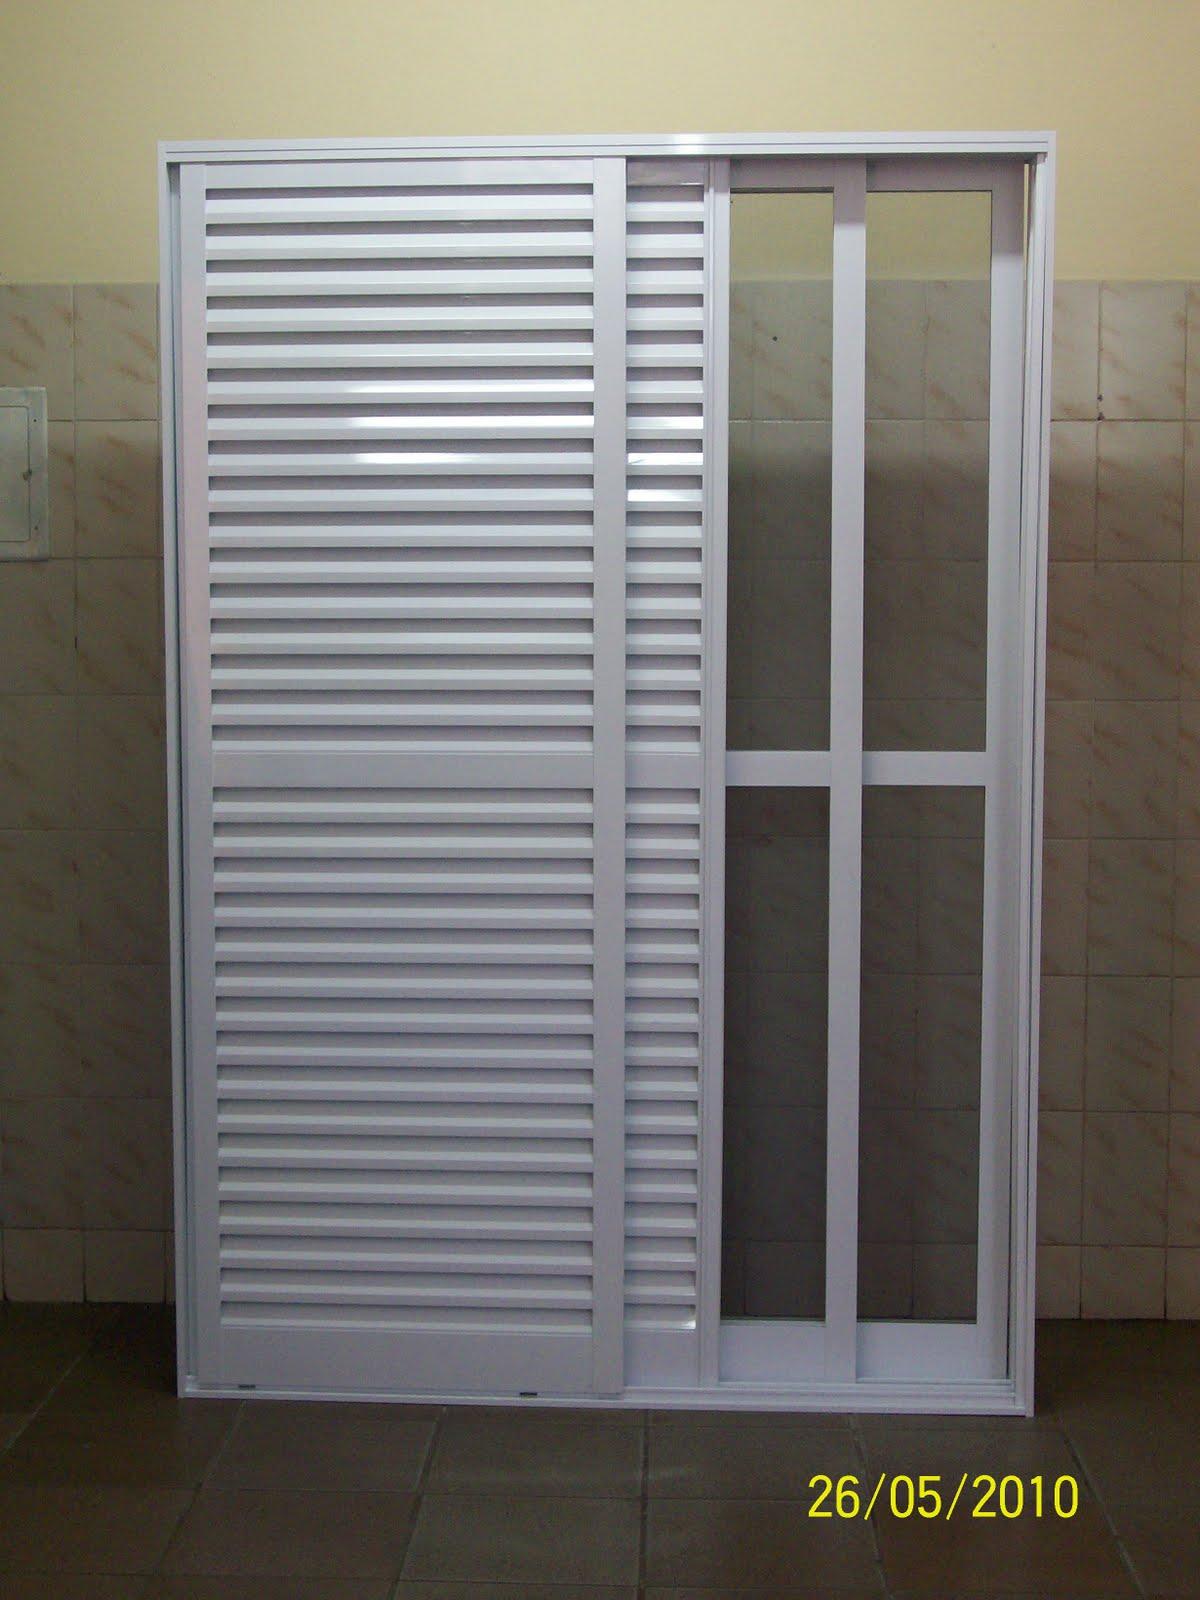 #81764A IPAL ESQUADRIAS DE ALUMINIO E VIDROS 4290 Janela Aluminio Branco 2 Folhas